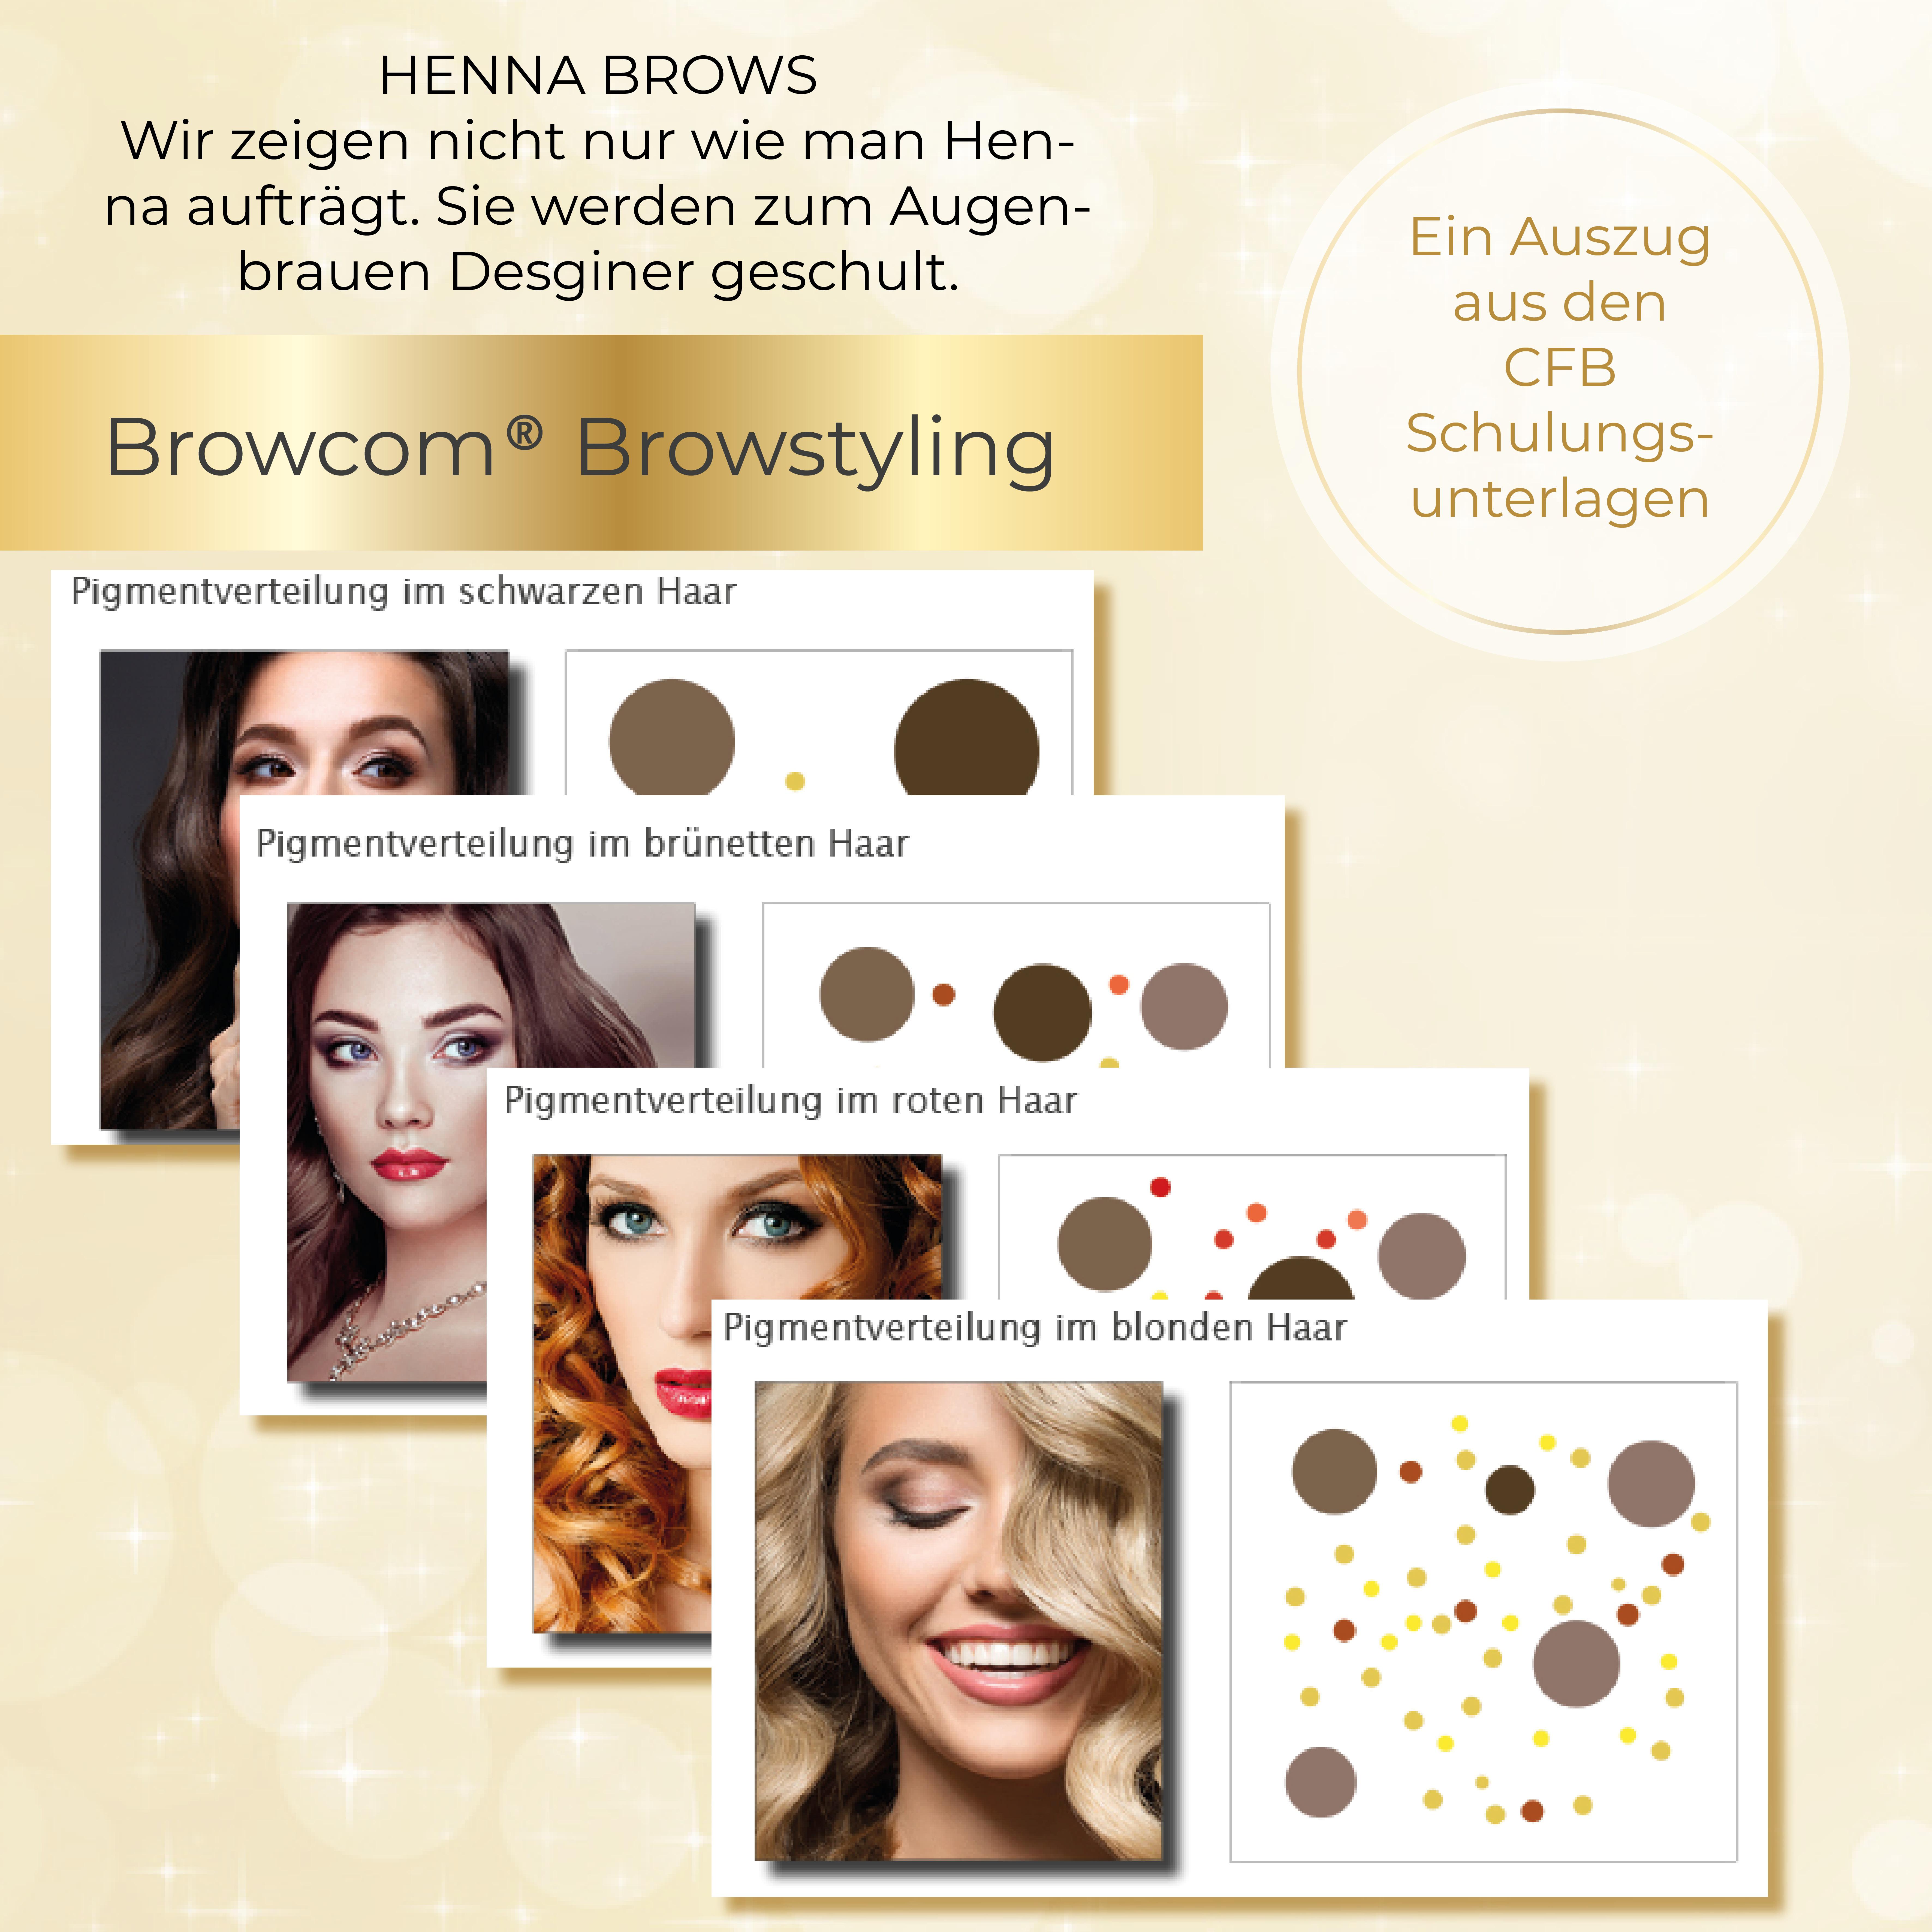 Browcom® Browstyling & Browhenna